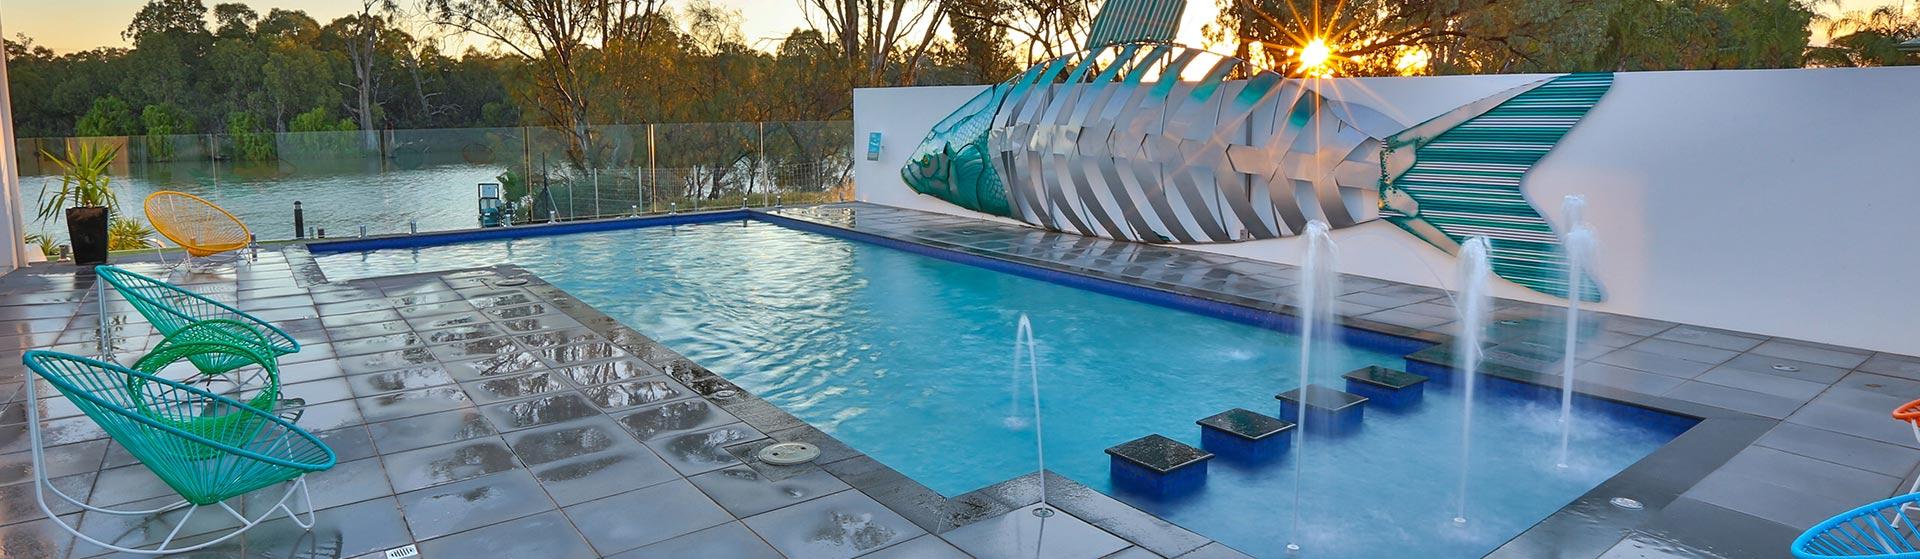 extreme-pool3-slide